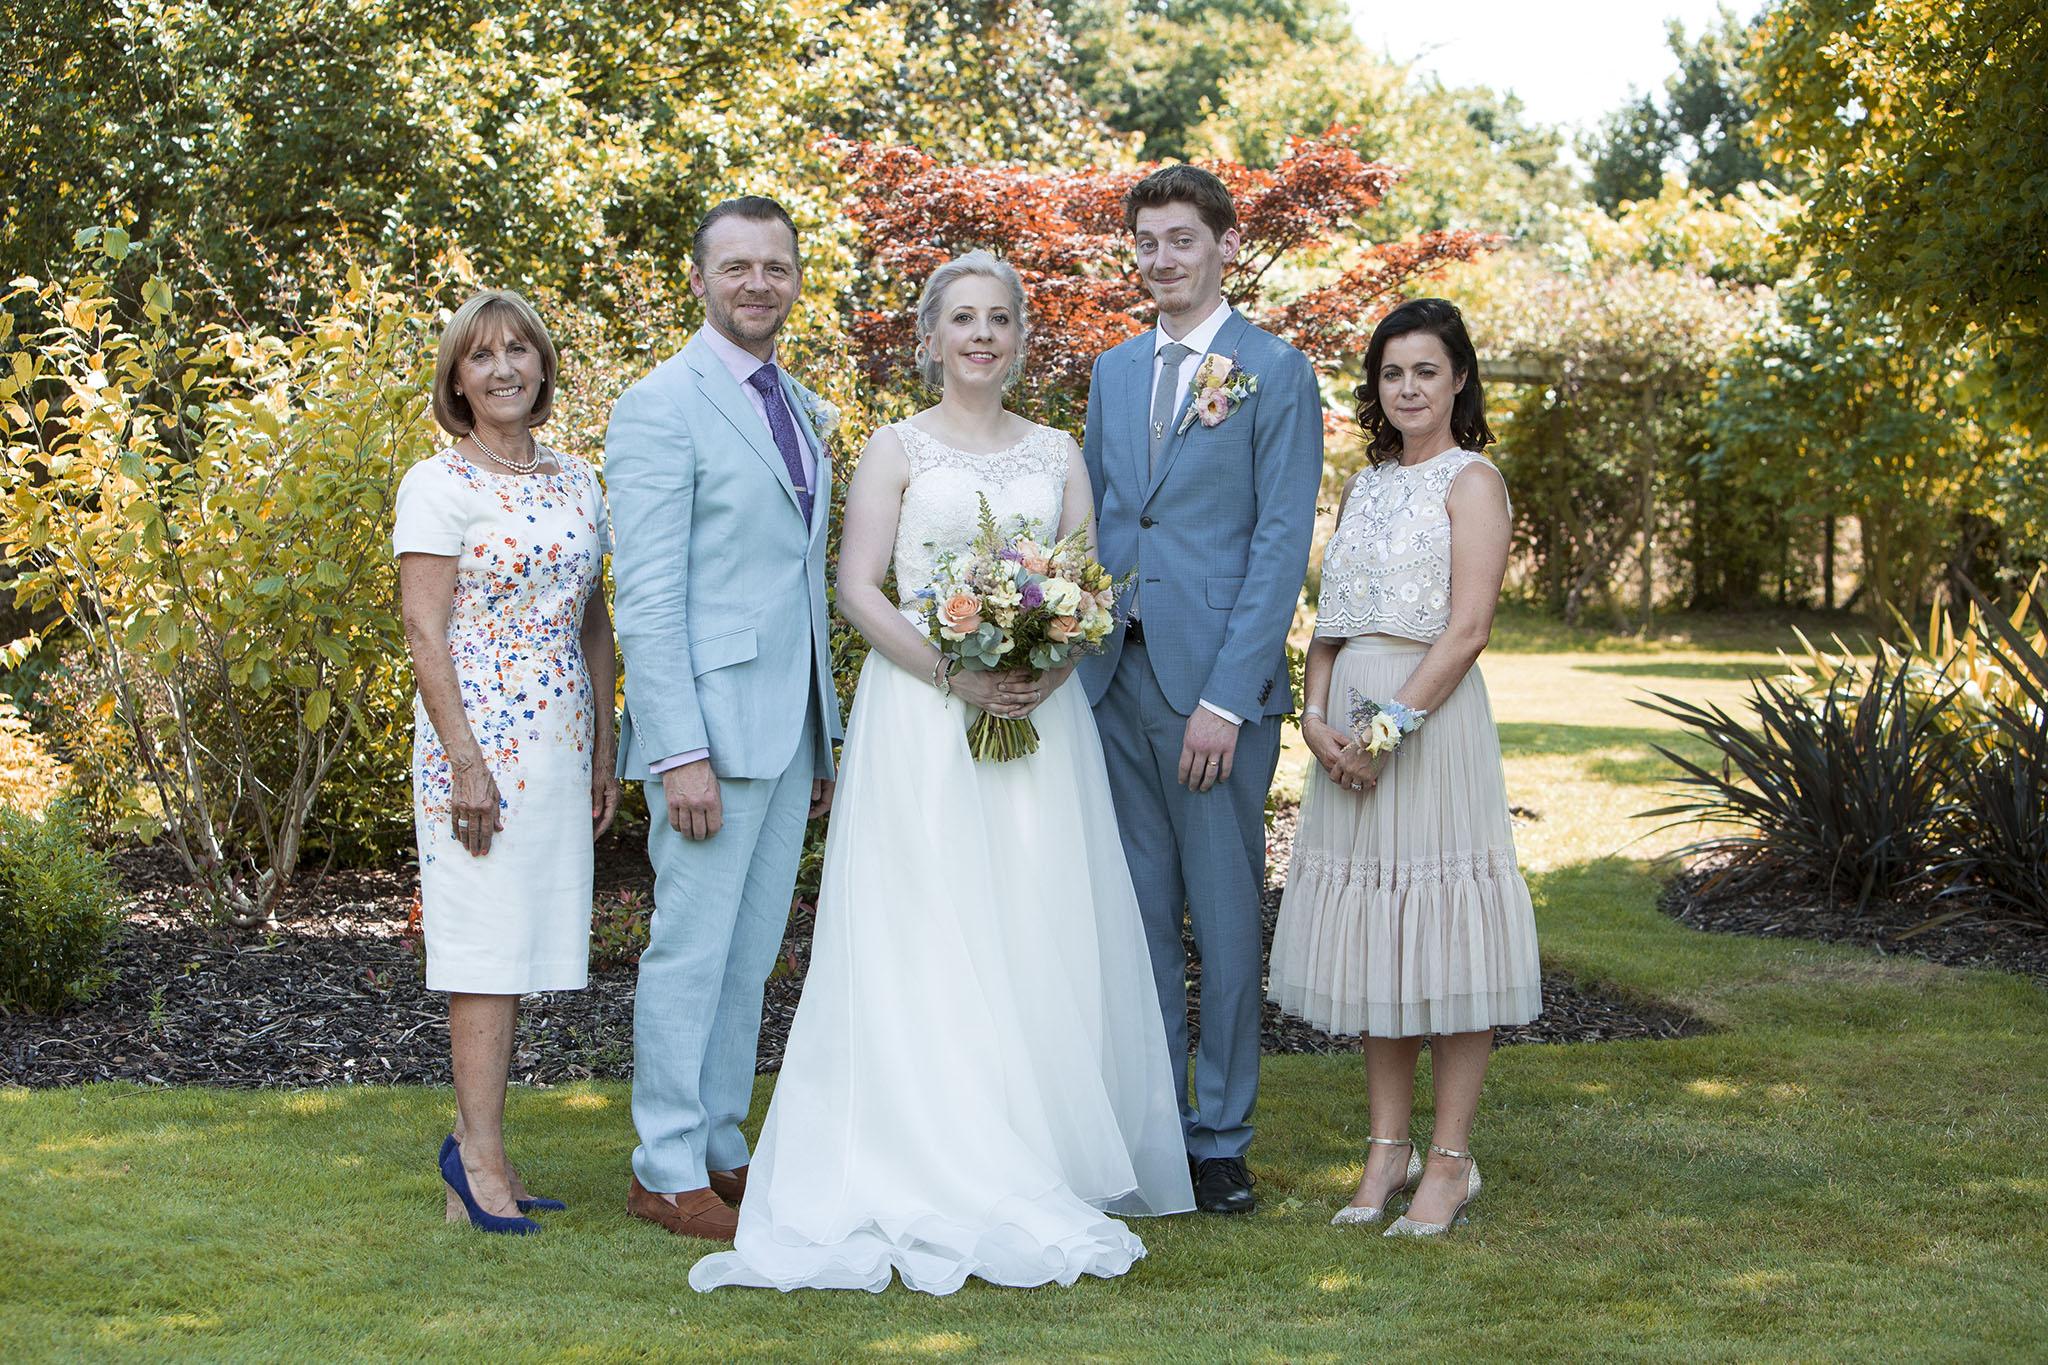 elizabethgphotography_kingslangley_hertfordshire_fineart_wedding_pottersbar_matt_katie_pegg_26.jpg